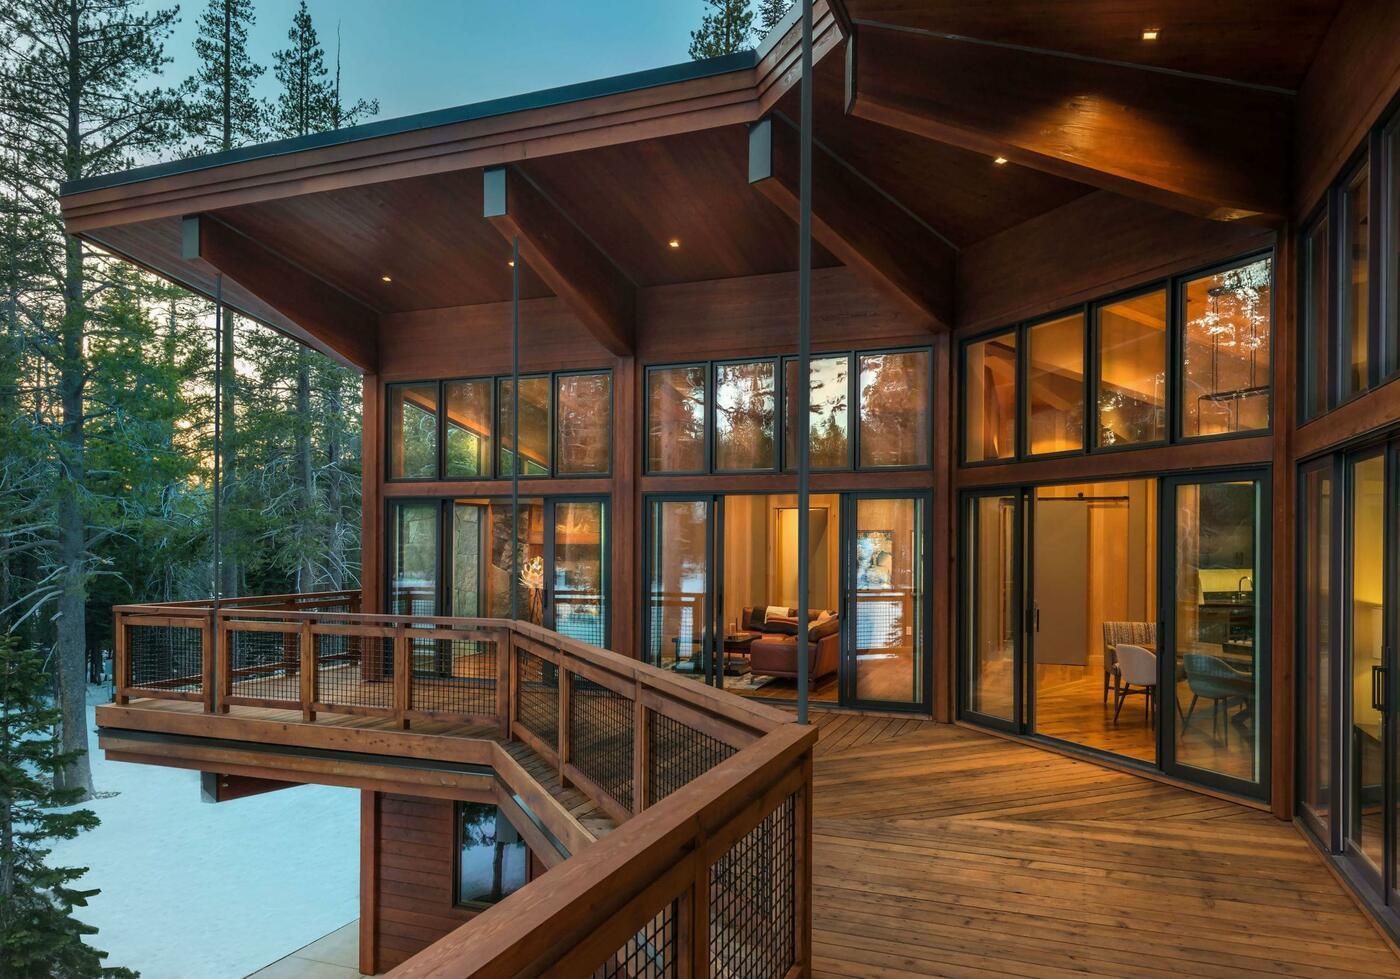 Cabin exterior design ideas